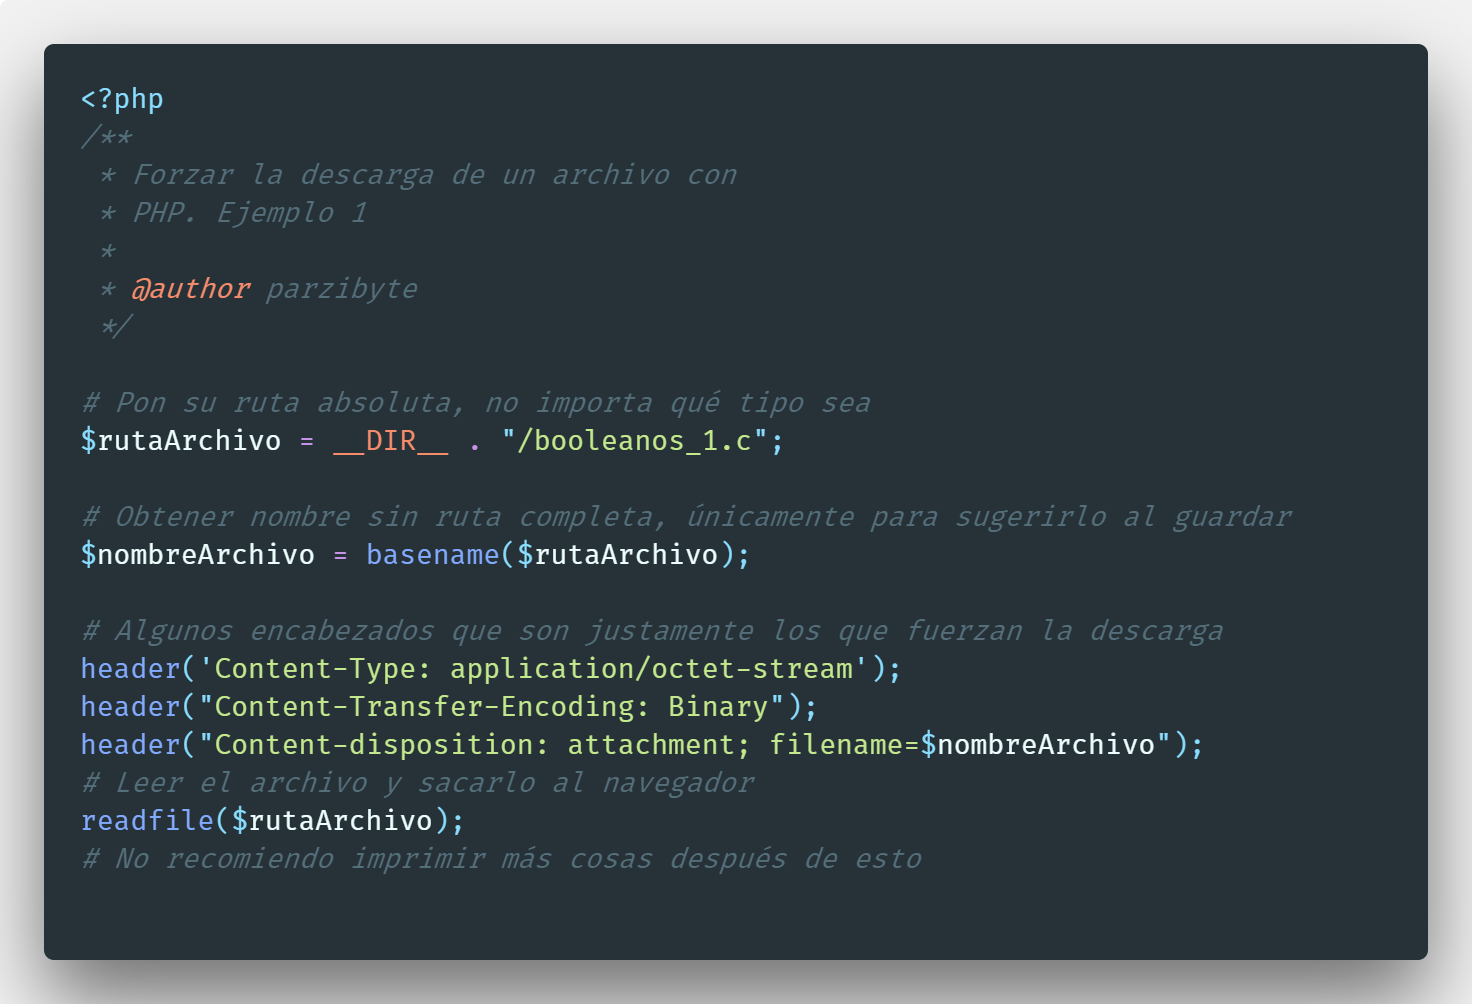 Forzar descarga de archivo con PHP y encabezados HTTP